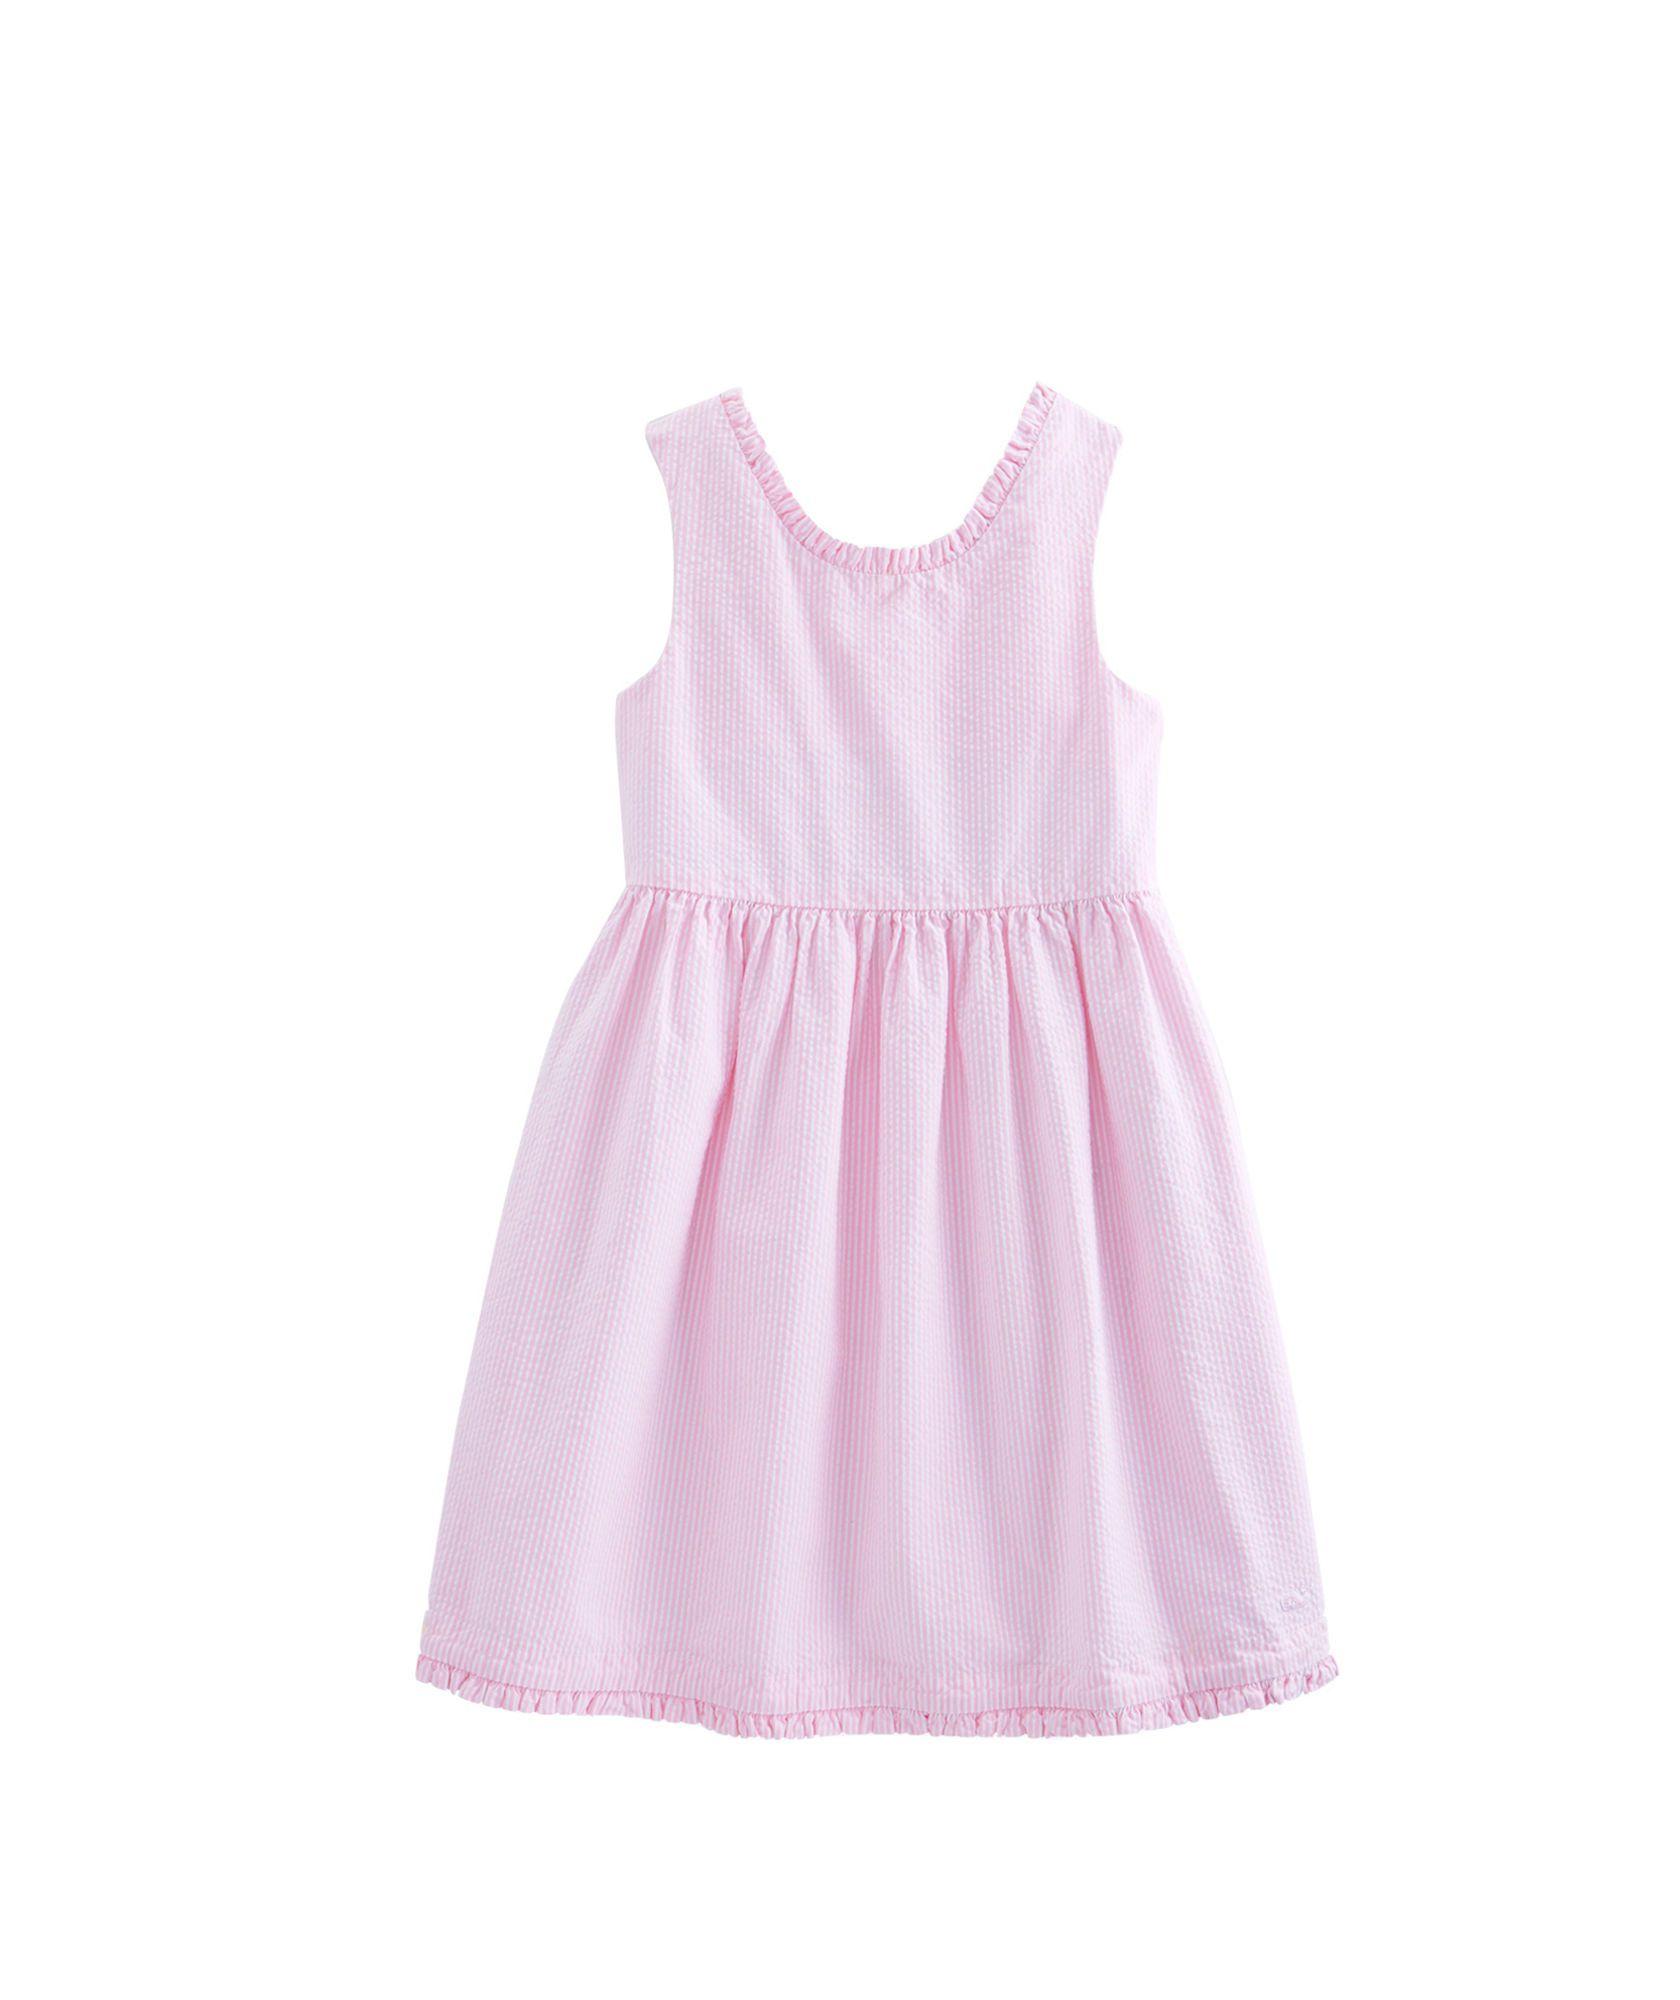 Girls Seersucker Ruffle Scoopback Dress